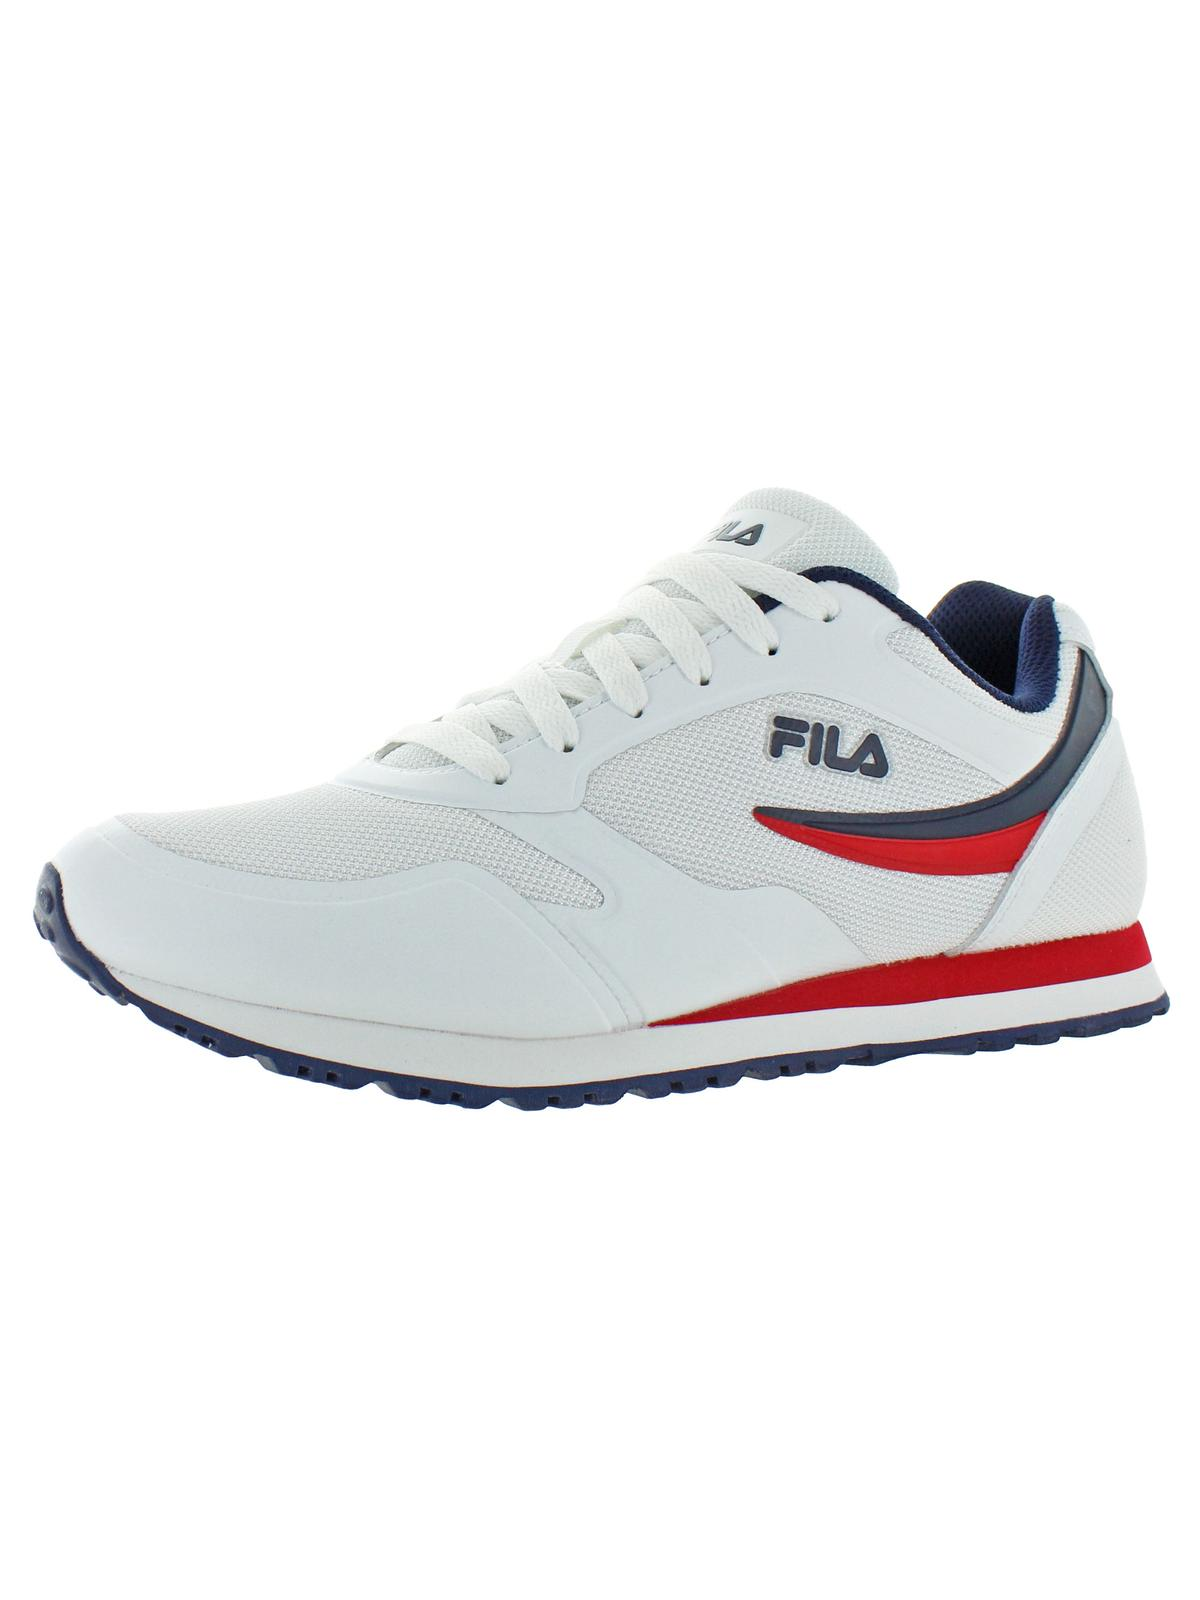 Fila Fila Mens Forerunner Breathable Sport Tennis Shoes